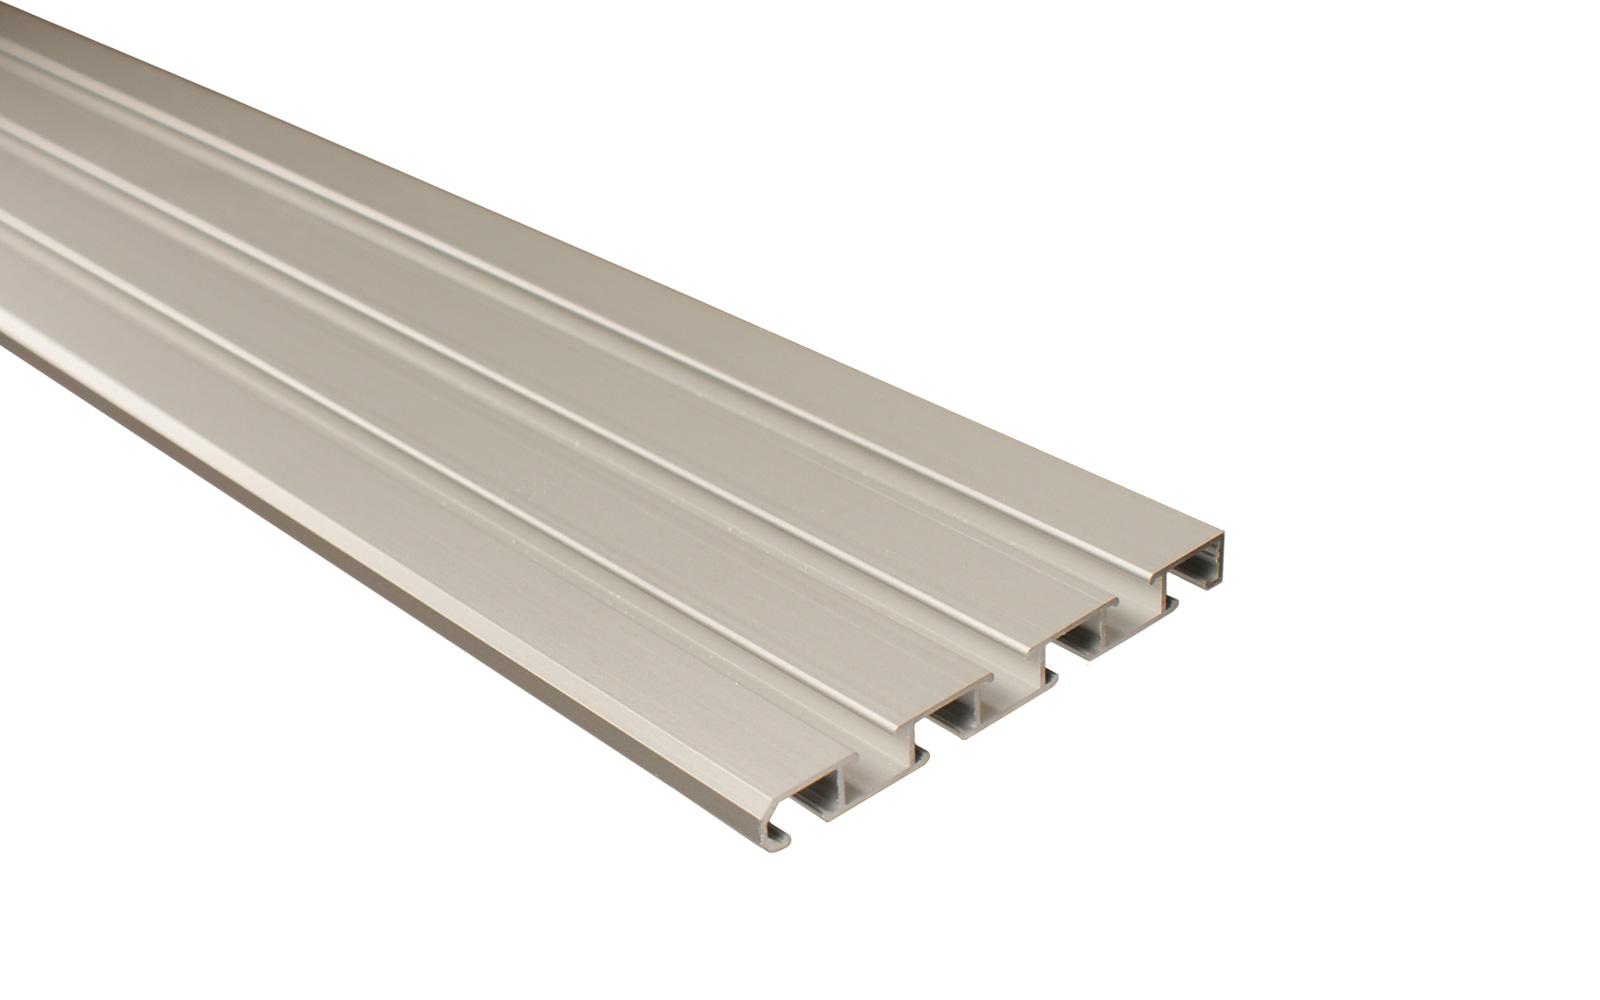 vorhangschiene 3 l ufig silber aus aluminium. Black Bedroom Furniture Sets. Home Design Ideas